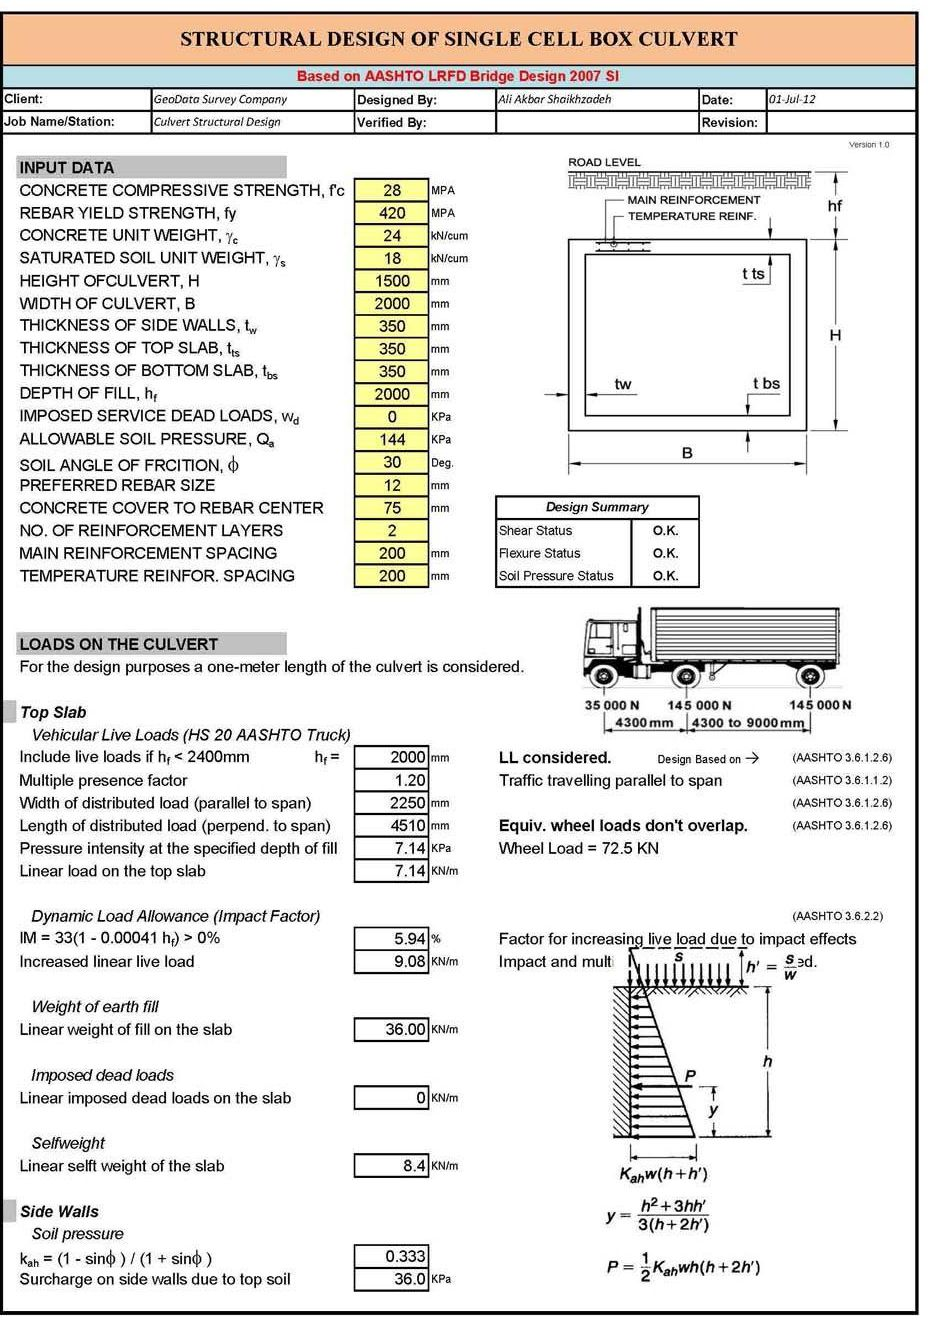 Box Culvert Design Spreadsheet  Culvert, Bridge design